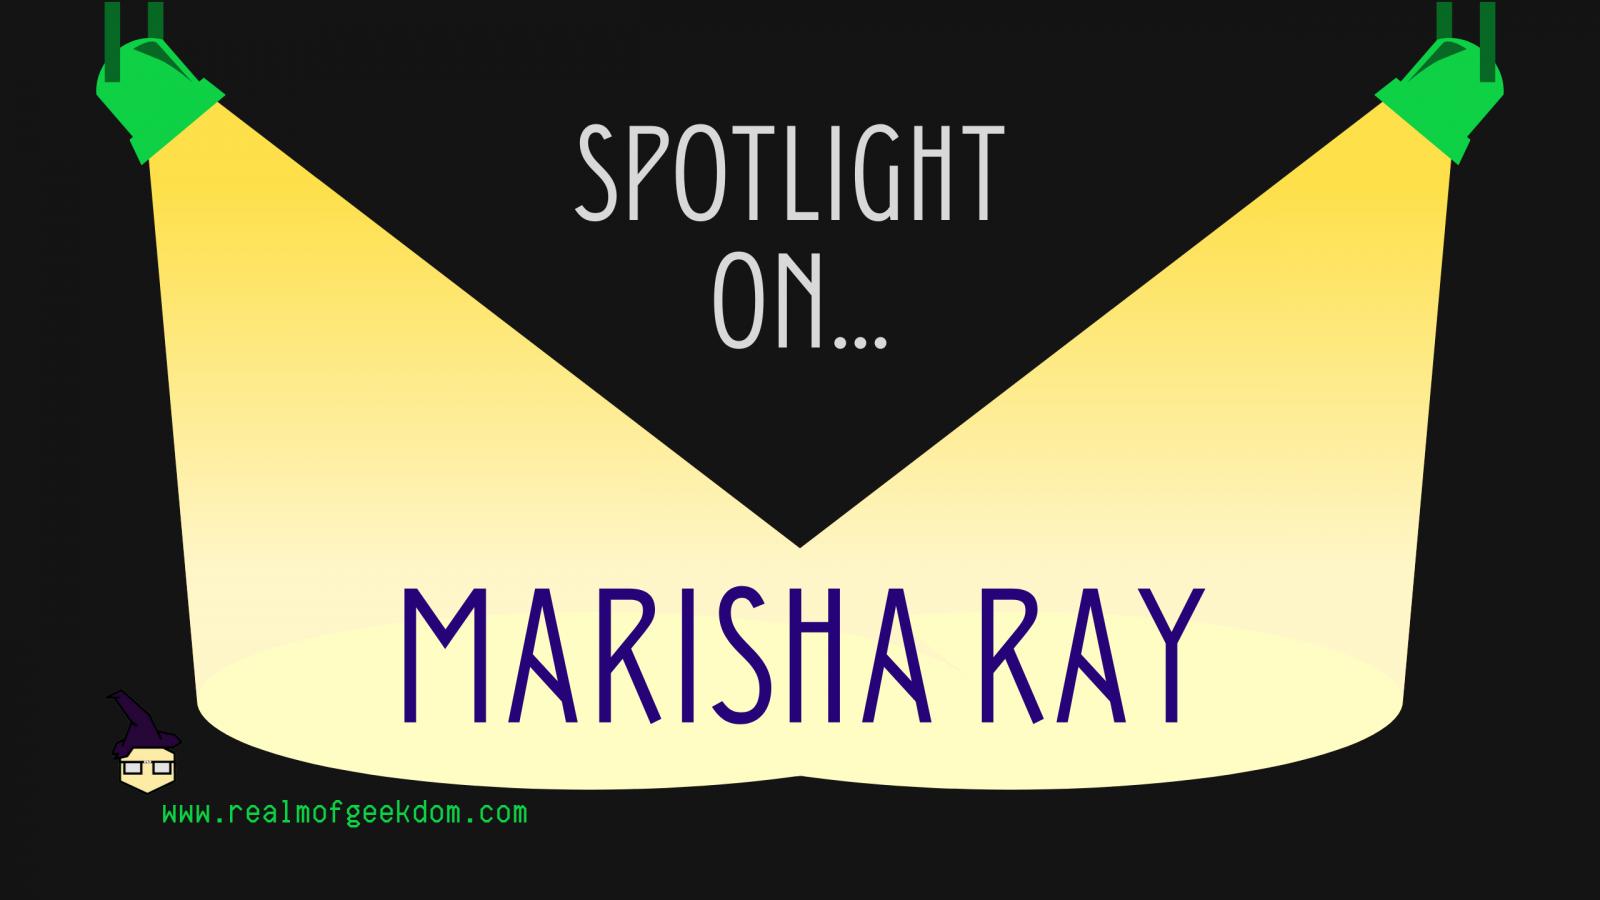 Spotlight On... Marisha Ray